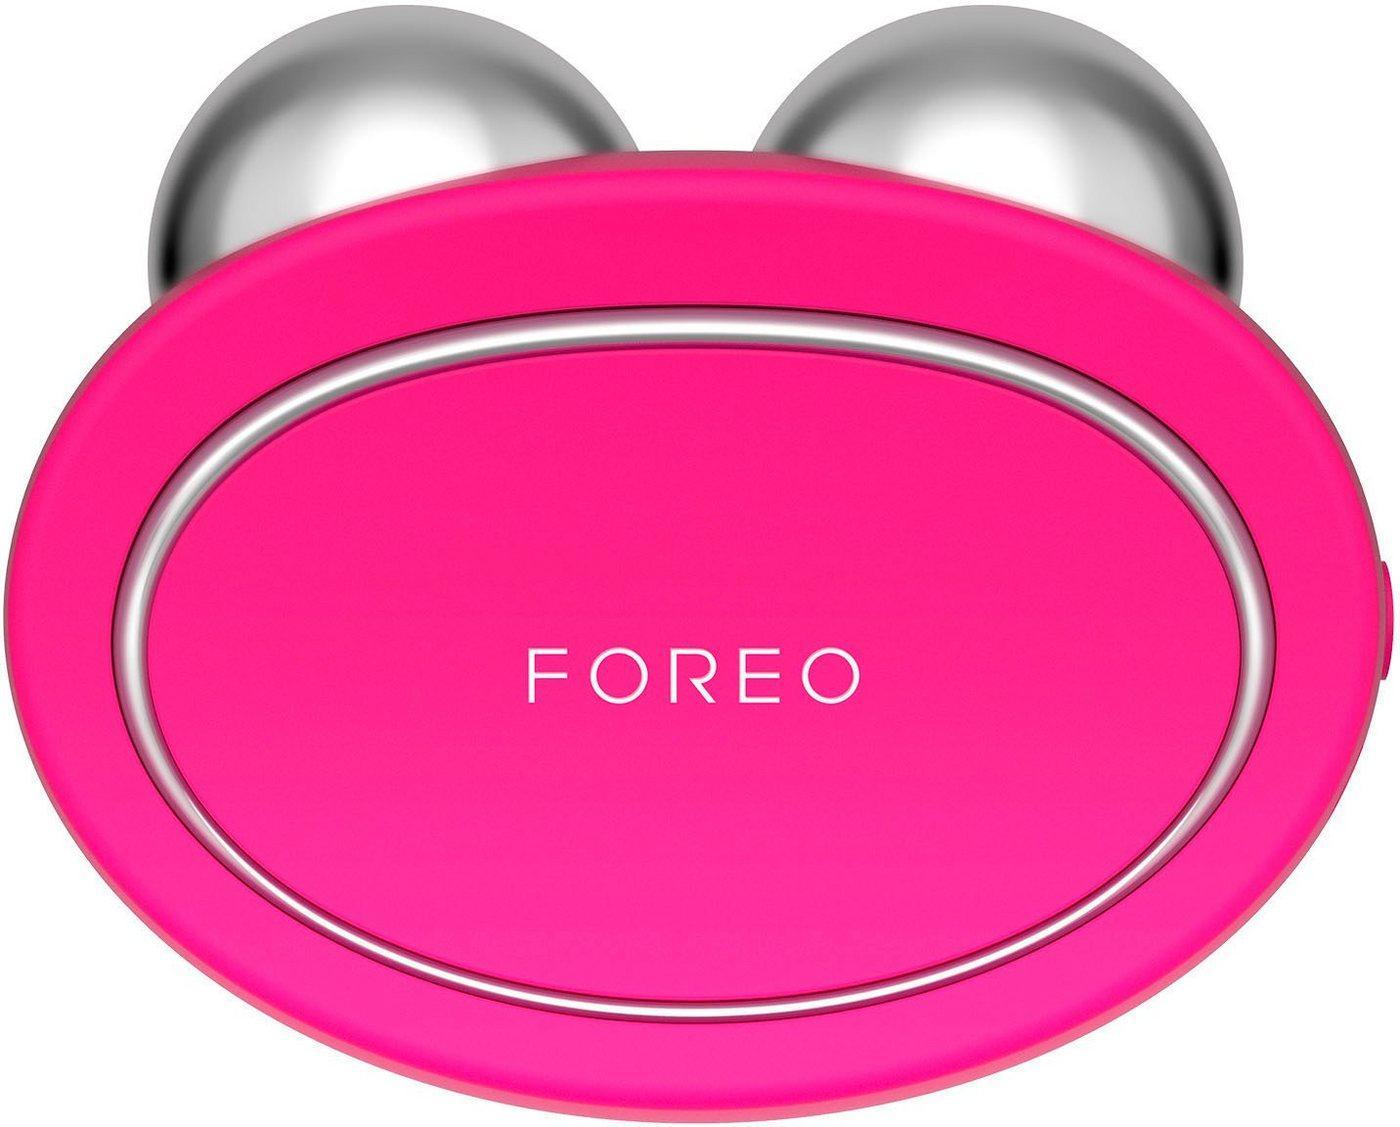 FOREO Anti-Aging-Gerät »BEAR Fuchsia«, Gerät zur Gesichtsstraffung